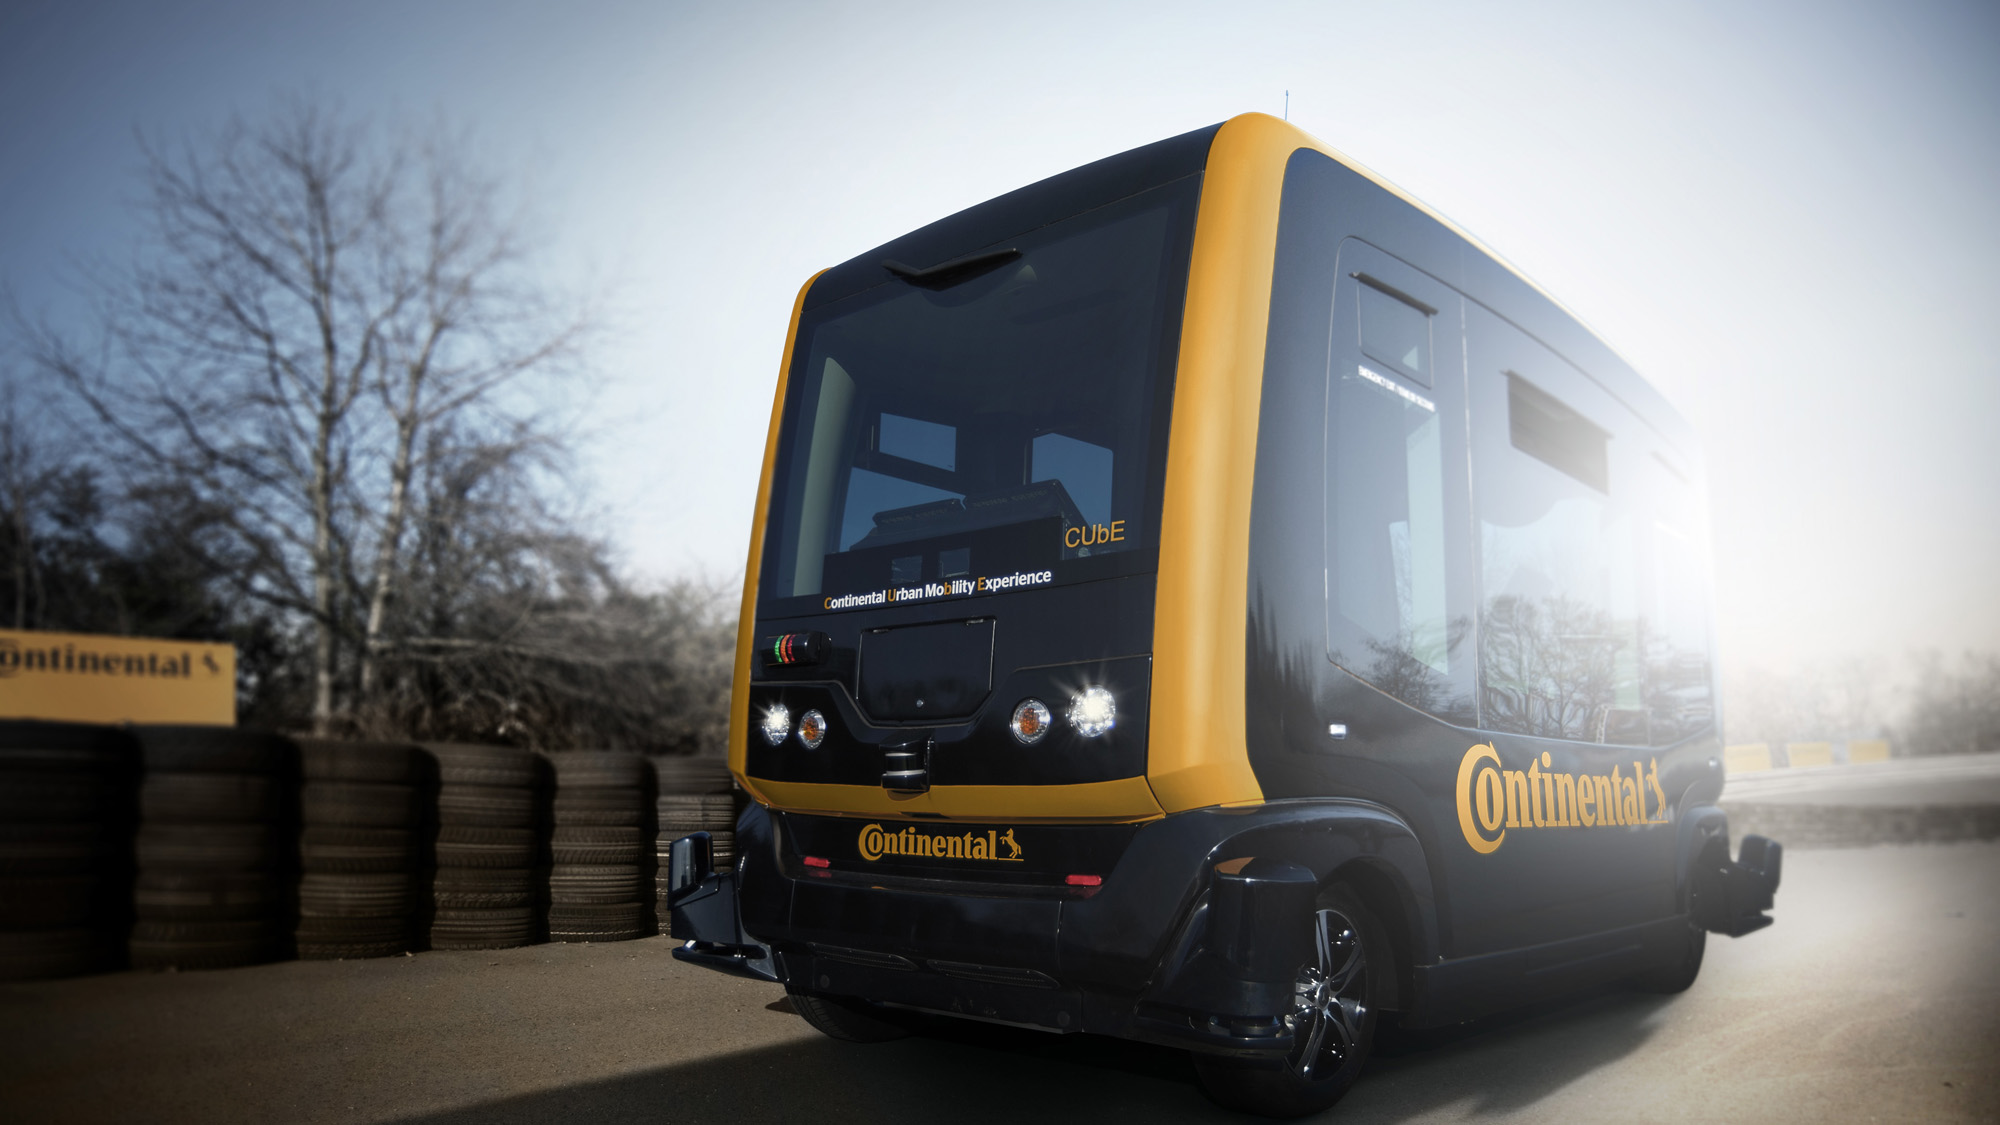 CUbE, der autonom fahrende Mini-Bus von Continental © Continental